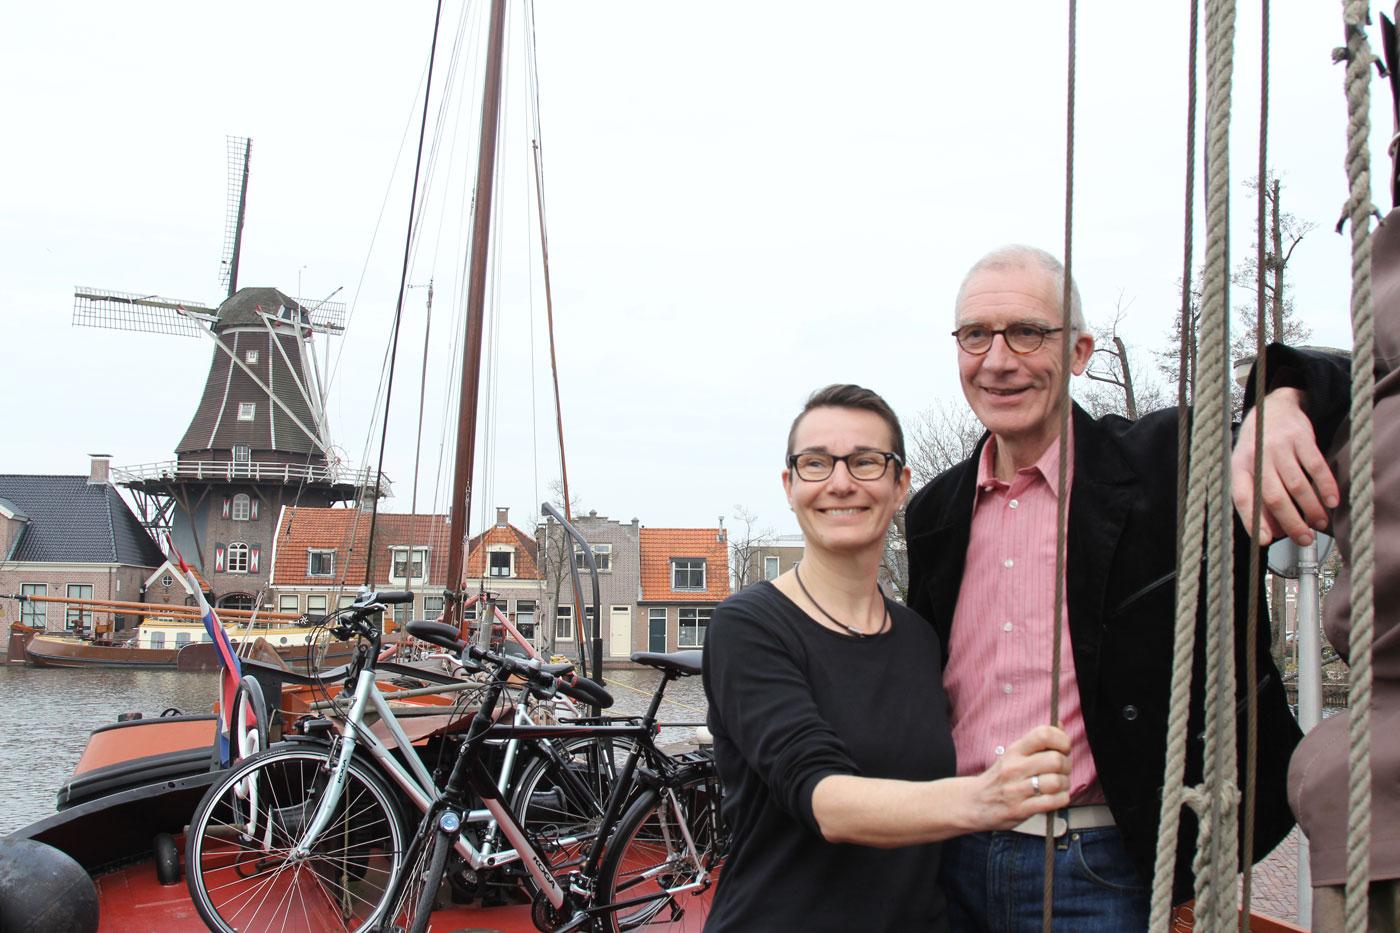 Wonen Op Woonboot : Wonen woonboot drenthe drenthe magazine